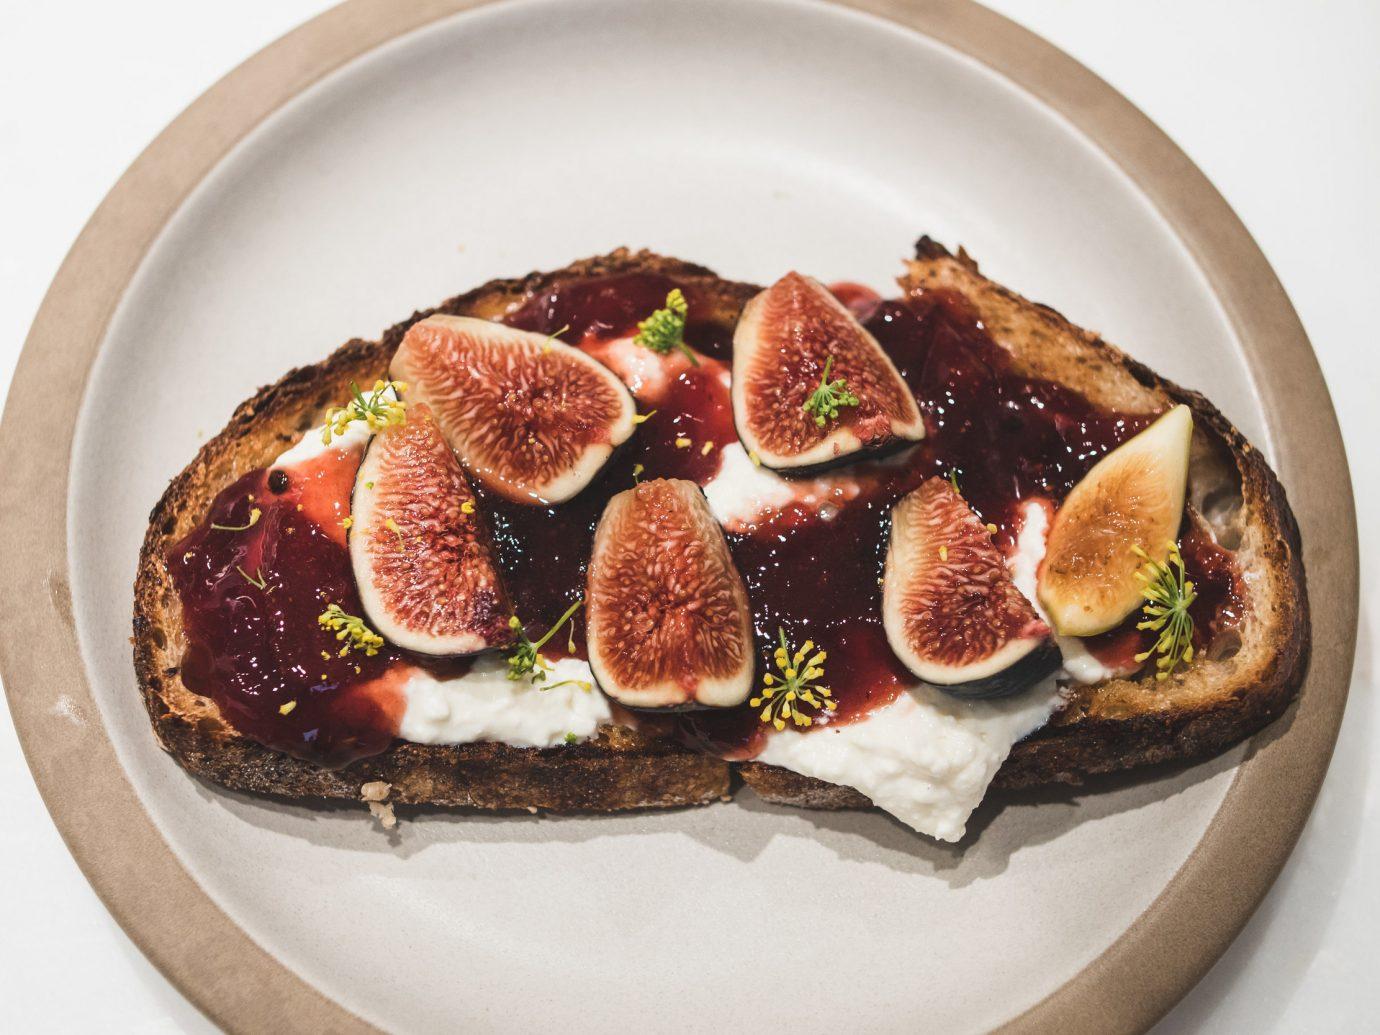 Food + Drink Travel Tips plate food dish appetizer cuisine slice finger food breakfast recipe dessert sliced arranged fresh